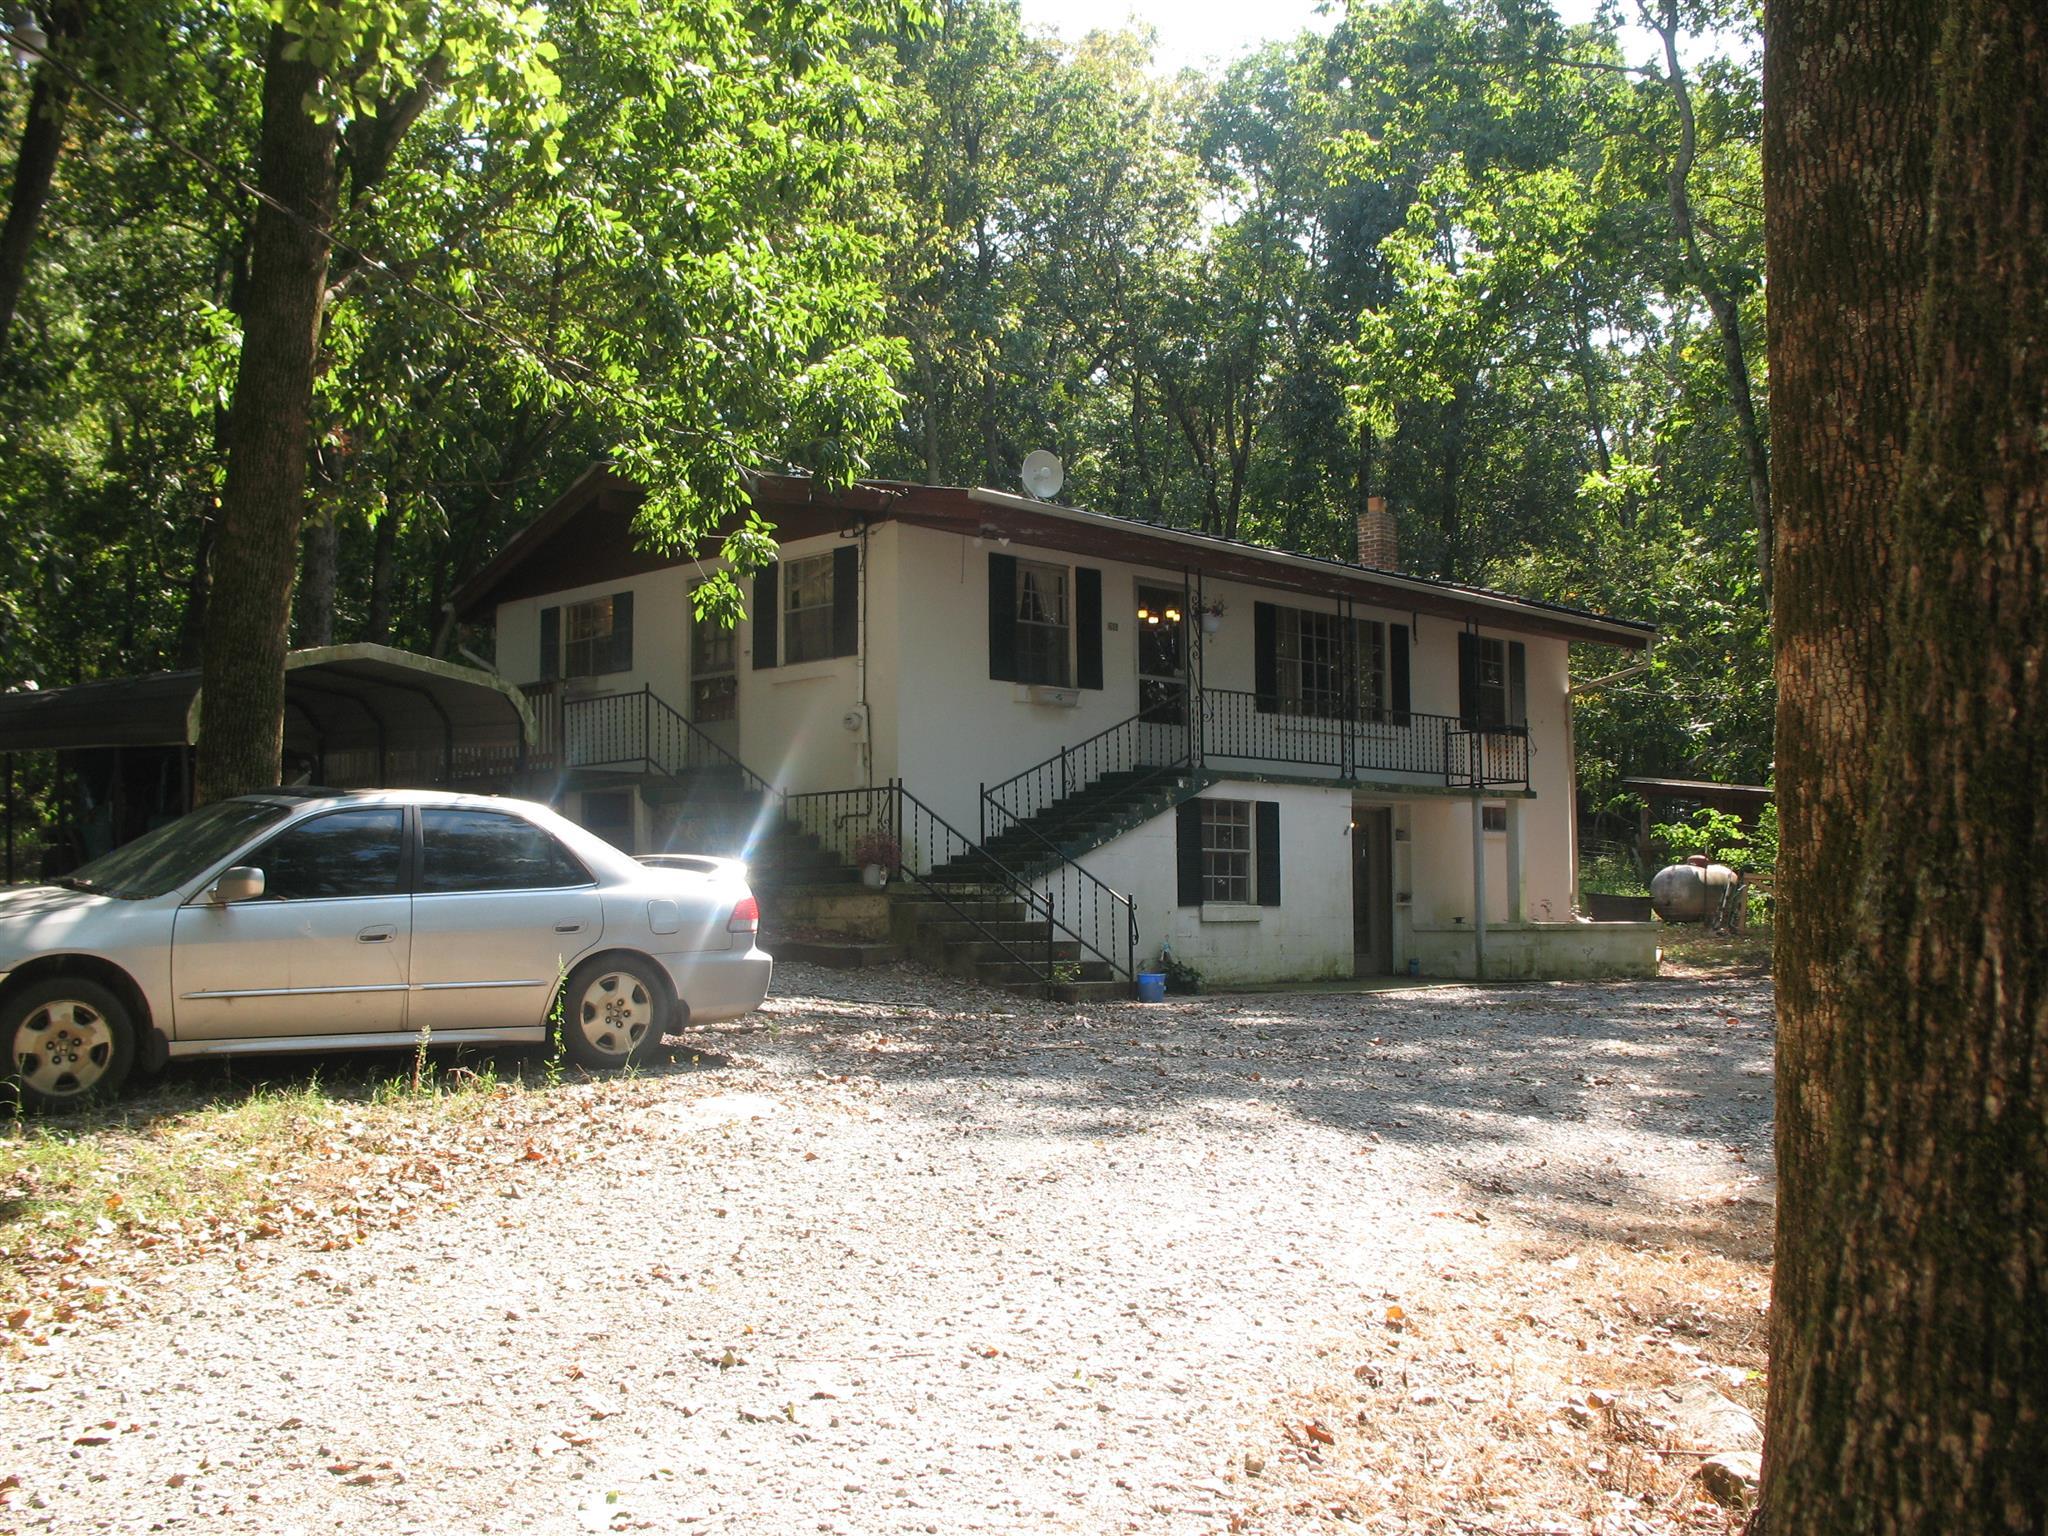 1609 Hickory Grove Rd, Huntland, TN 37345 - Huntland, TN real estate listing